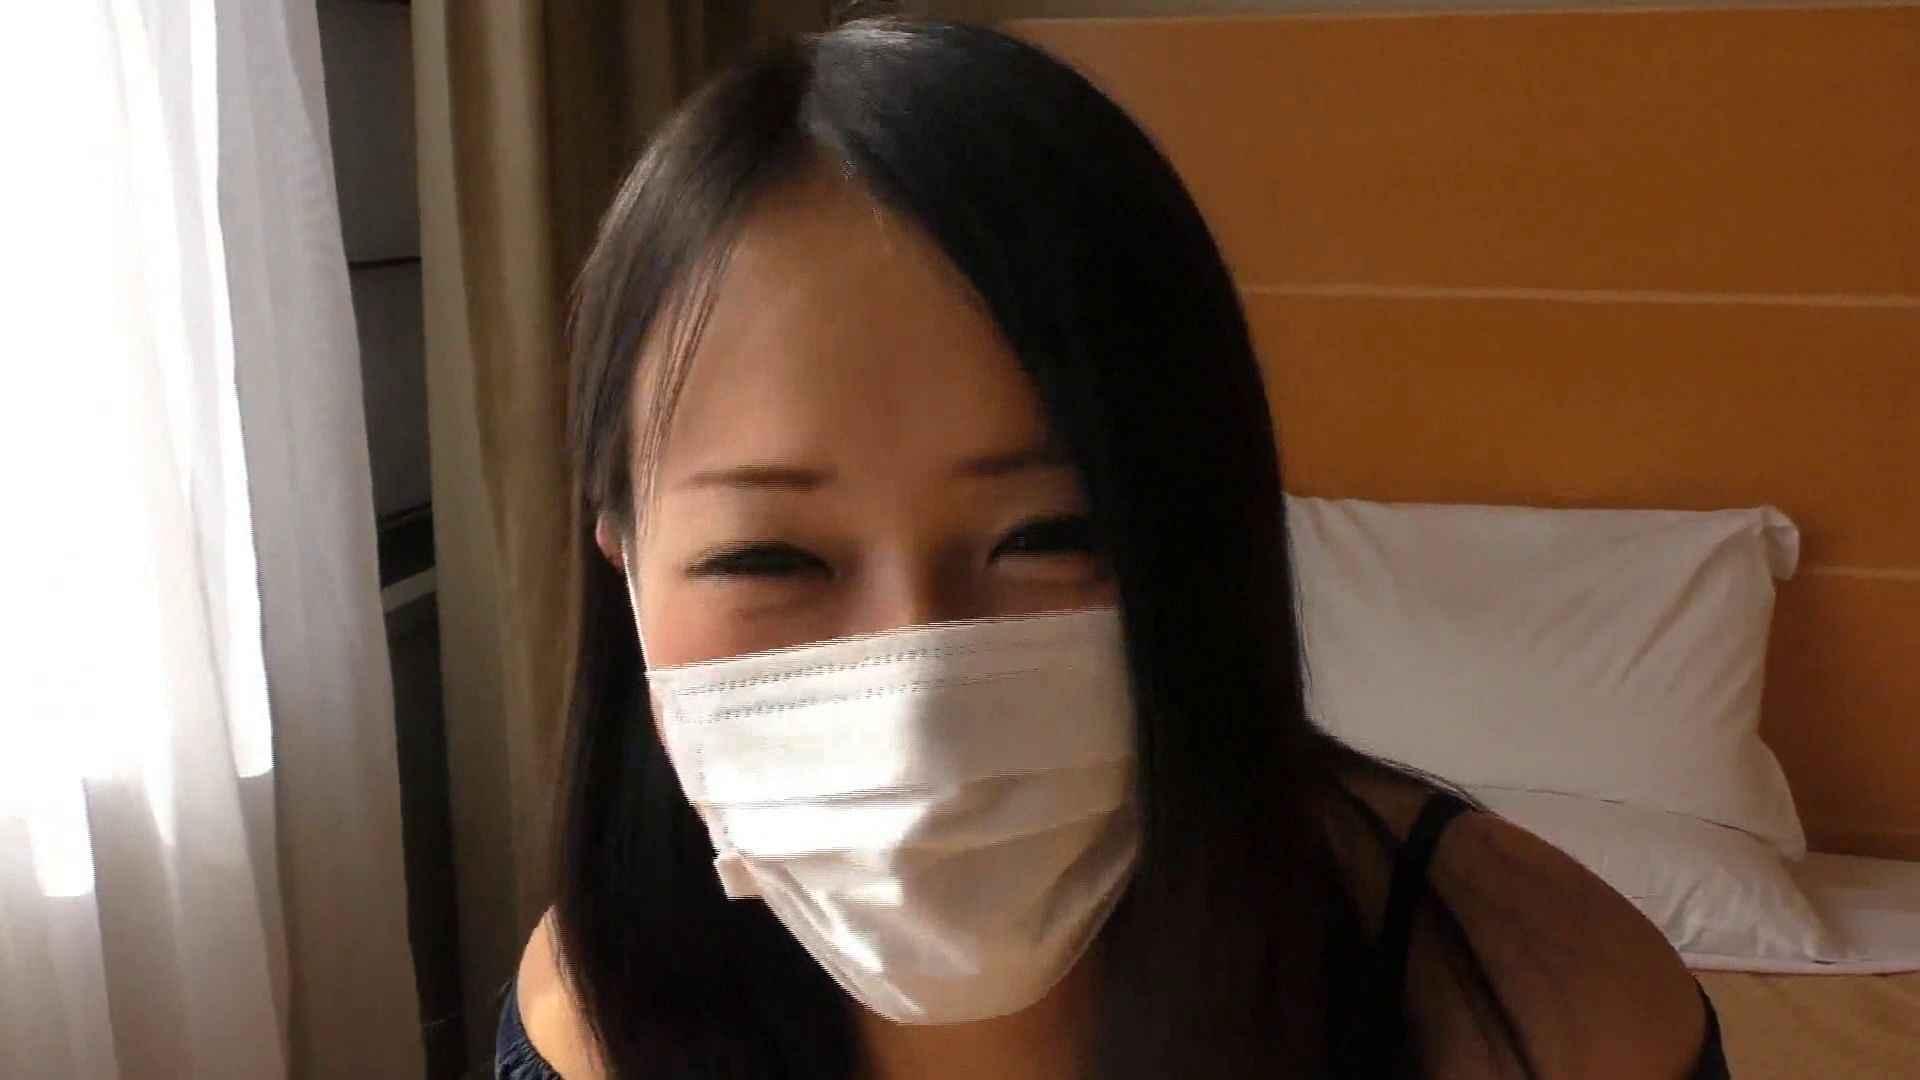 S級厳選美女ビッチガールVol.22 美女ヌード天国 ぱこり動画紹介 60PIX 2